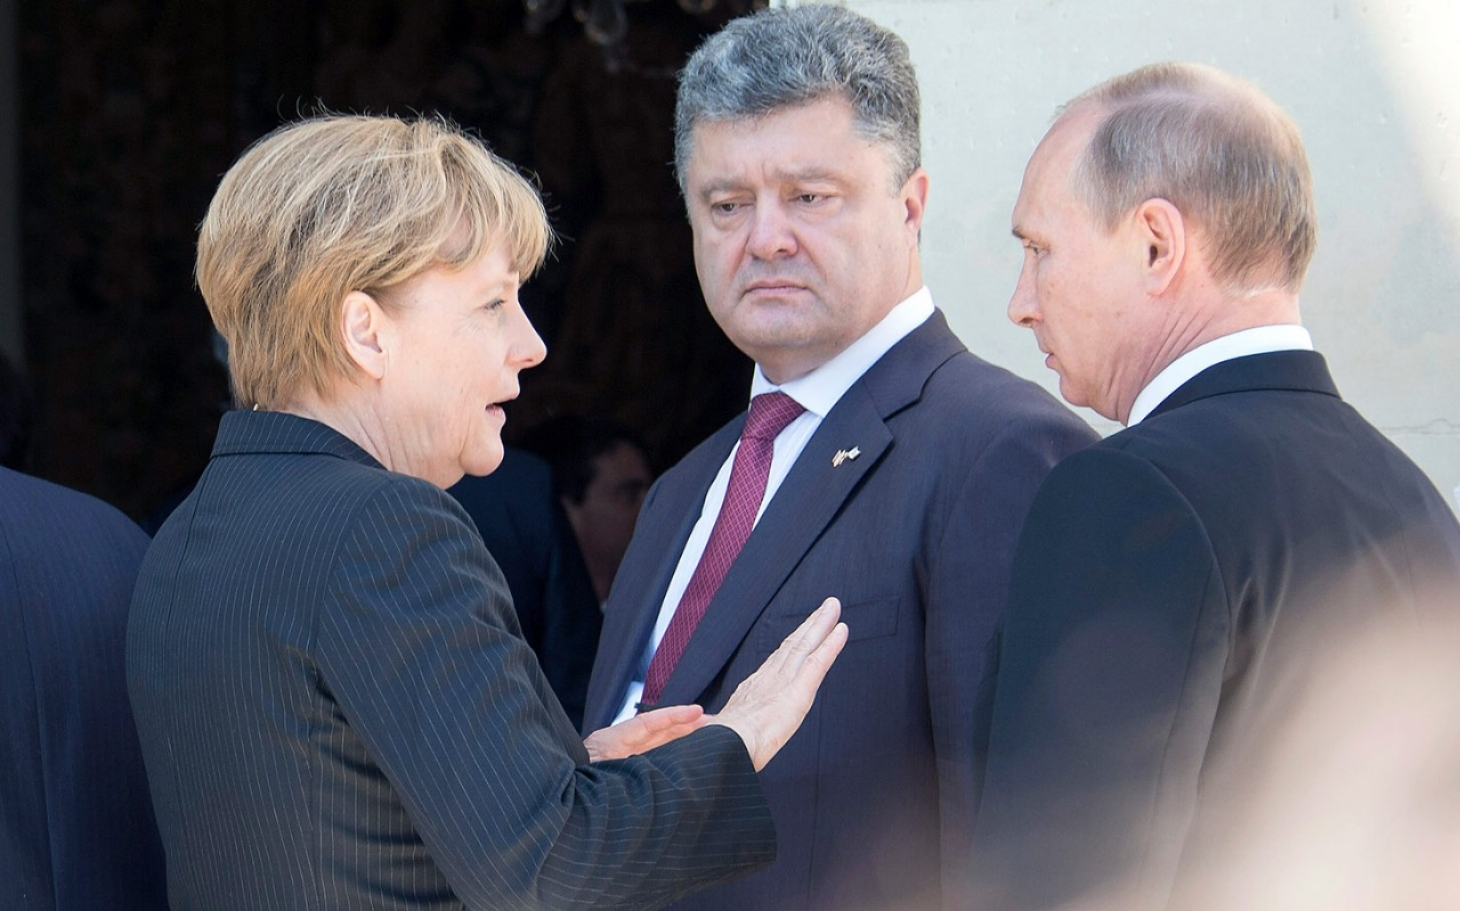 putin and ukraine president meet native american